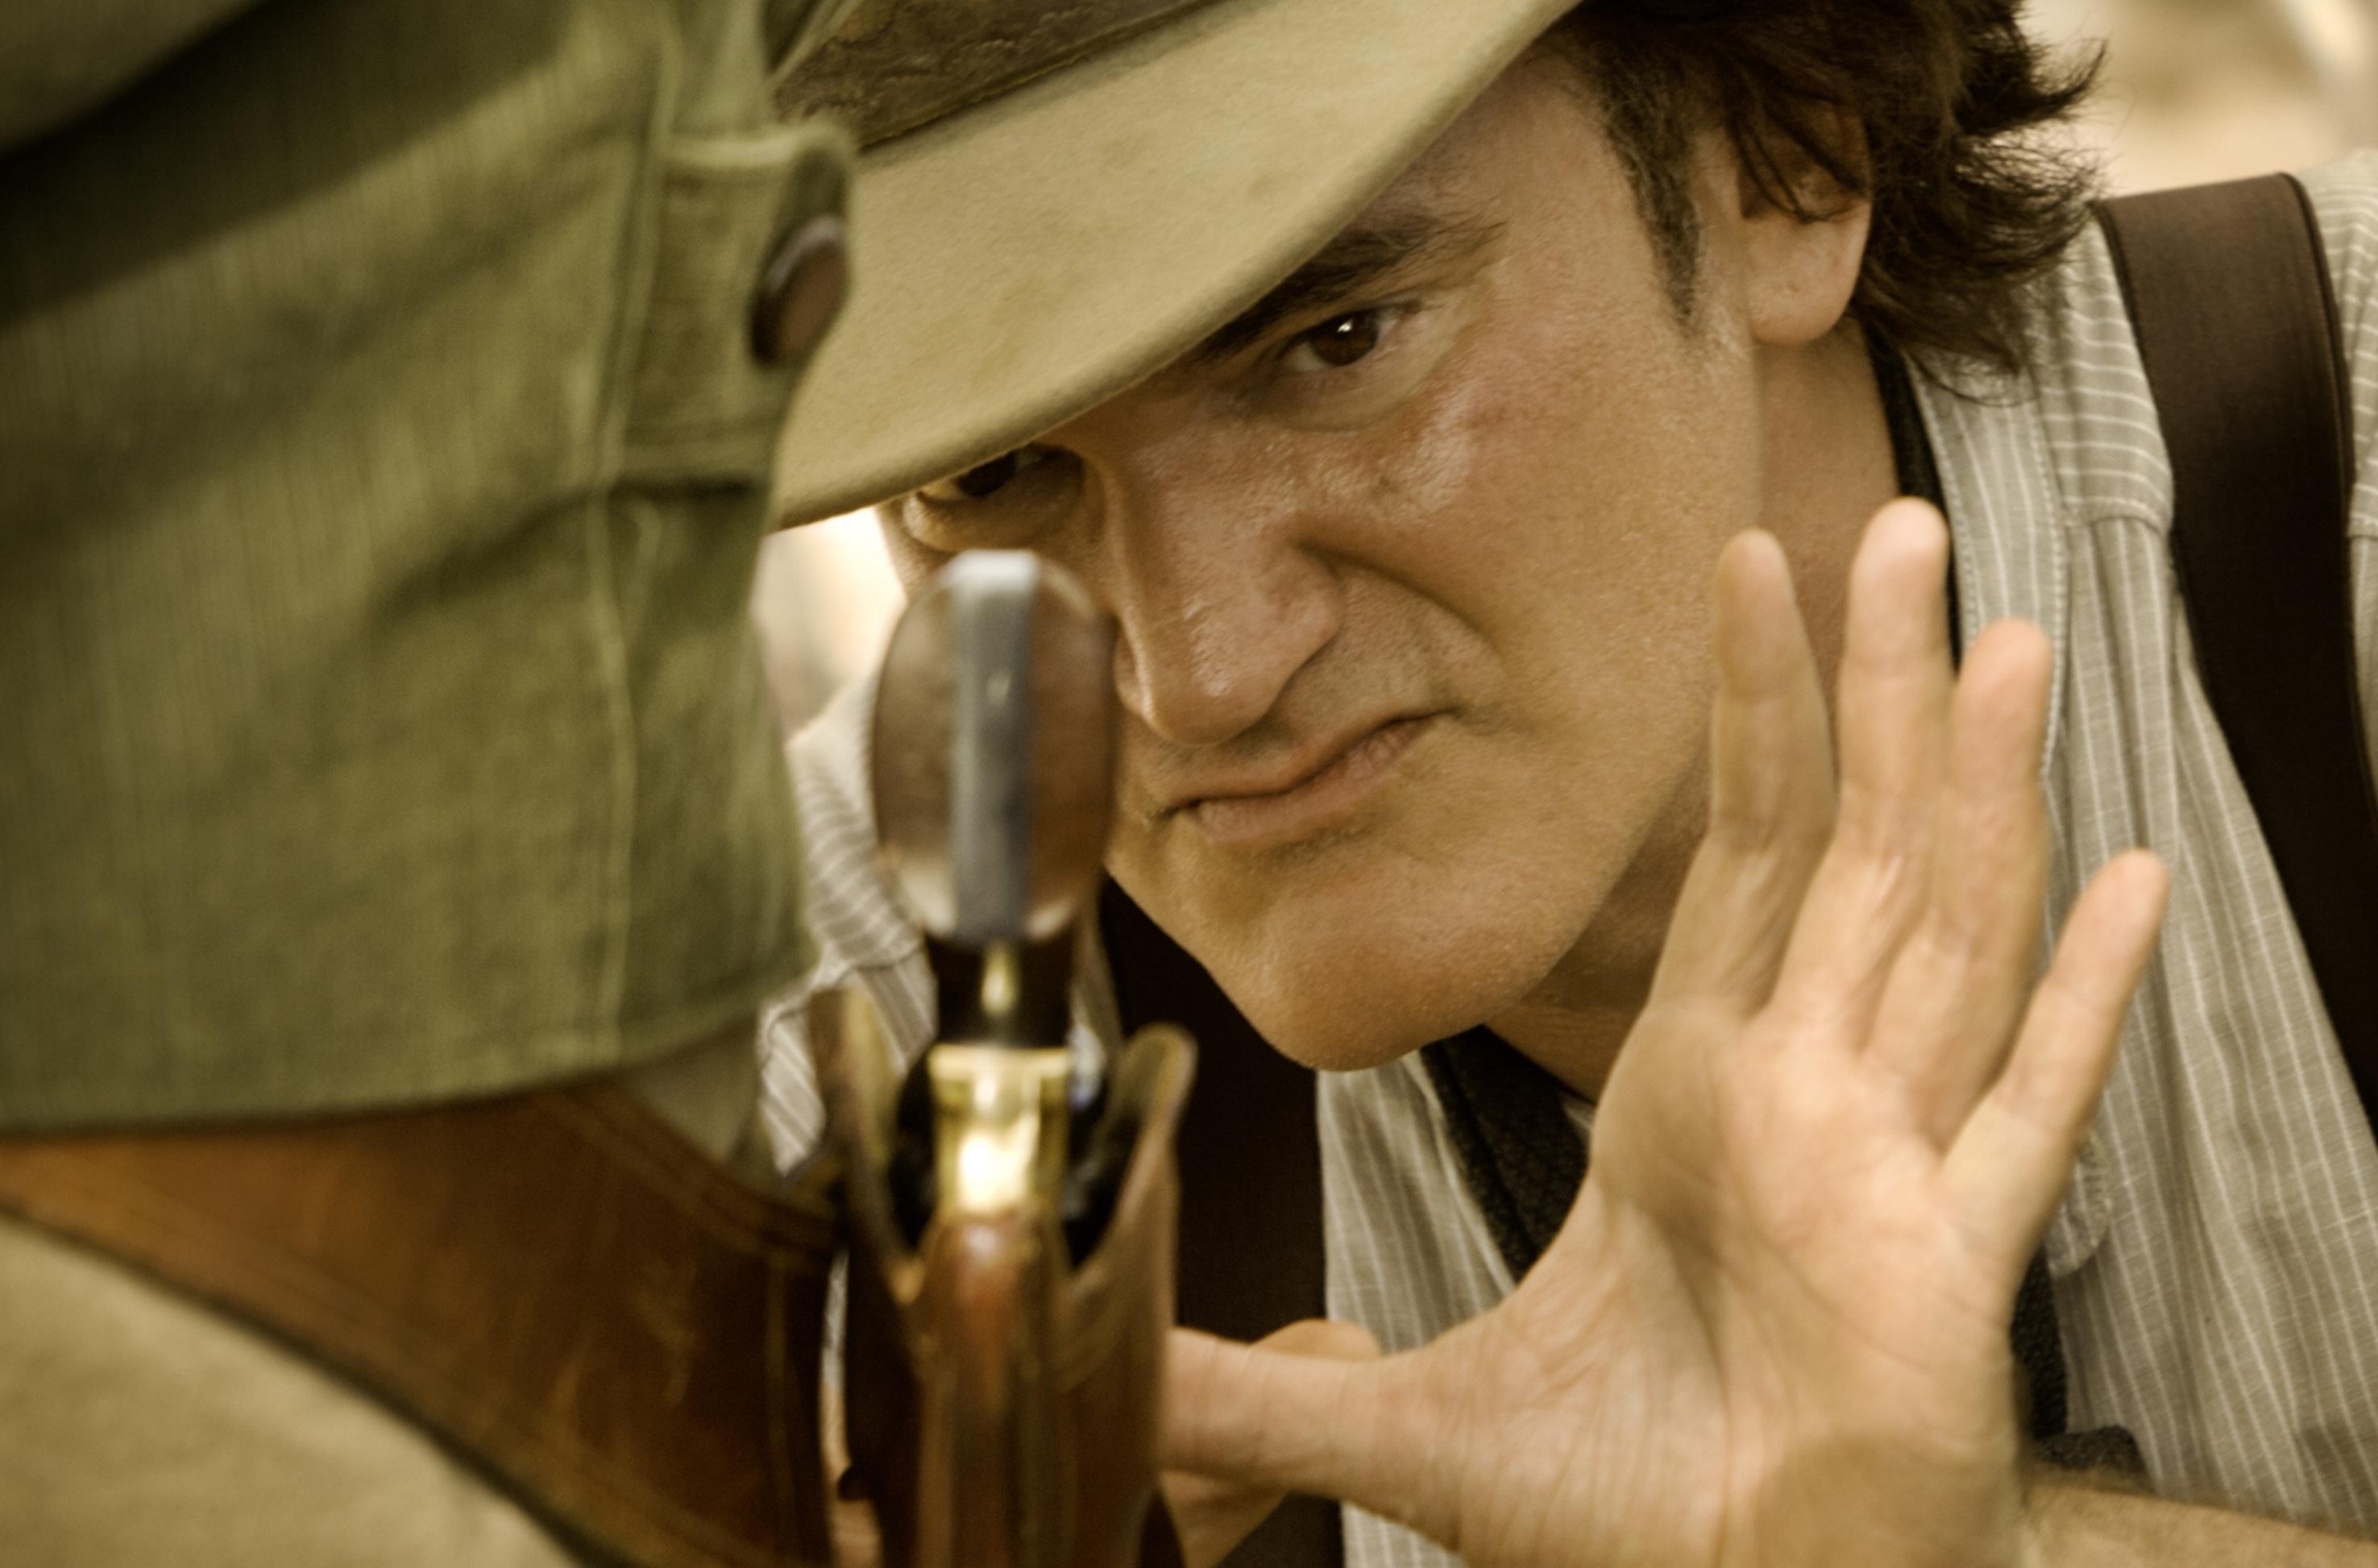 Director QUENTIN TARANTINO on the set of DJANGO UNCHAINED